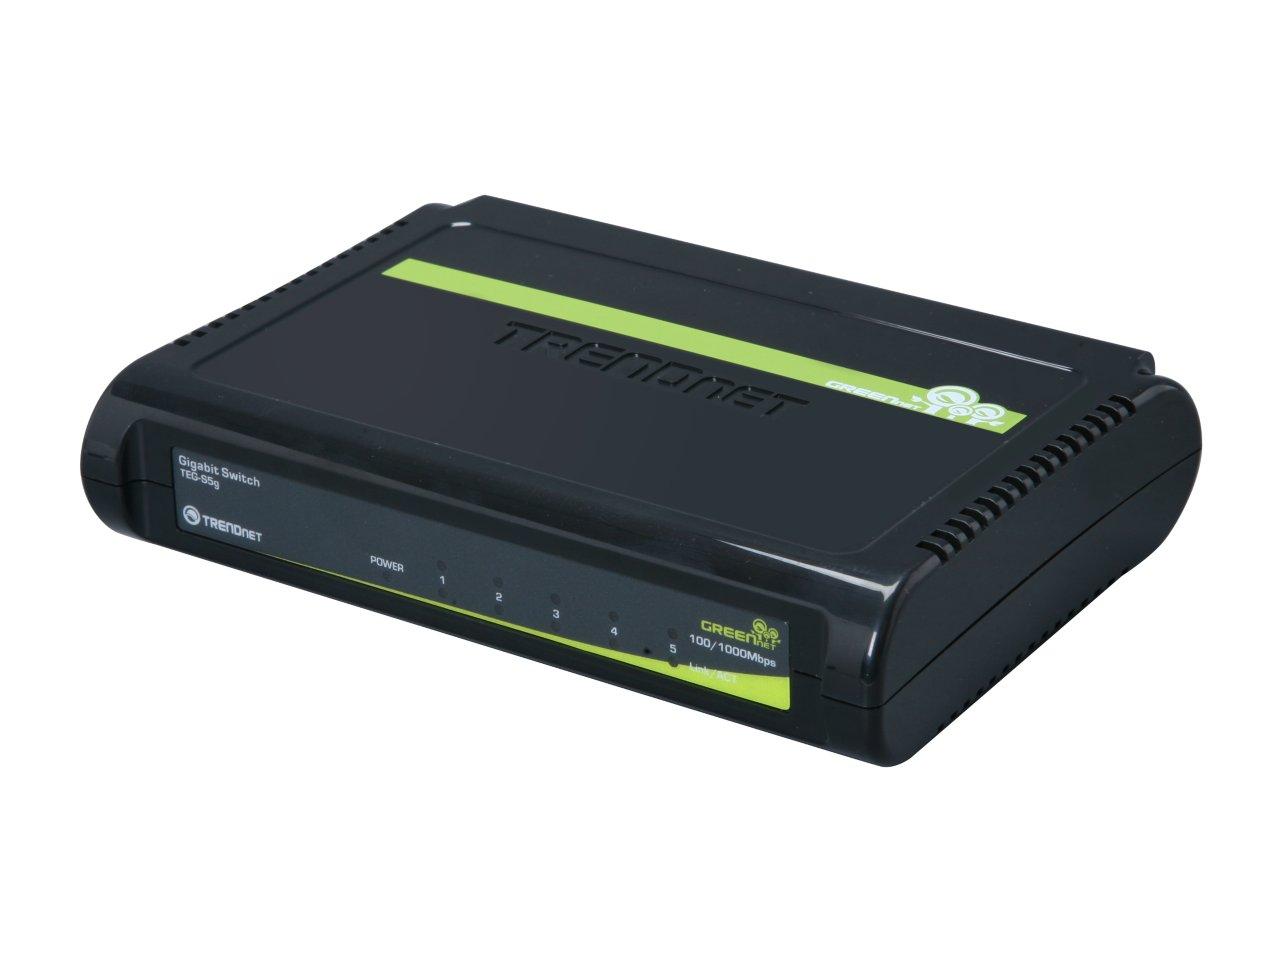 5-Port TRENDnet GREENnet Unmanaged Gigabit Switch (TEG-S5g) for $9.99 + Free Shipping @ Newegg.com